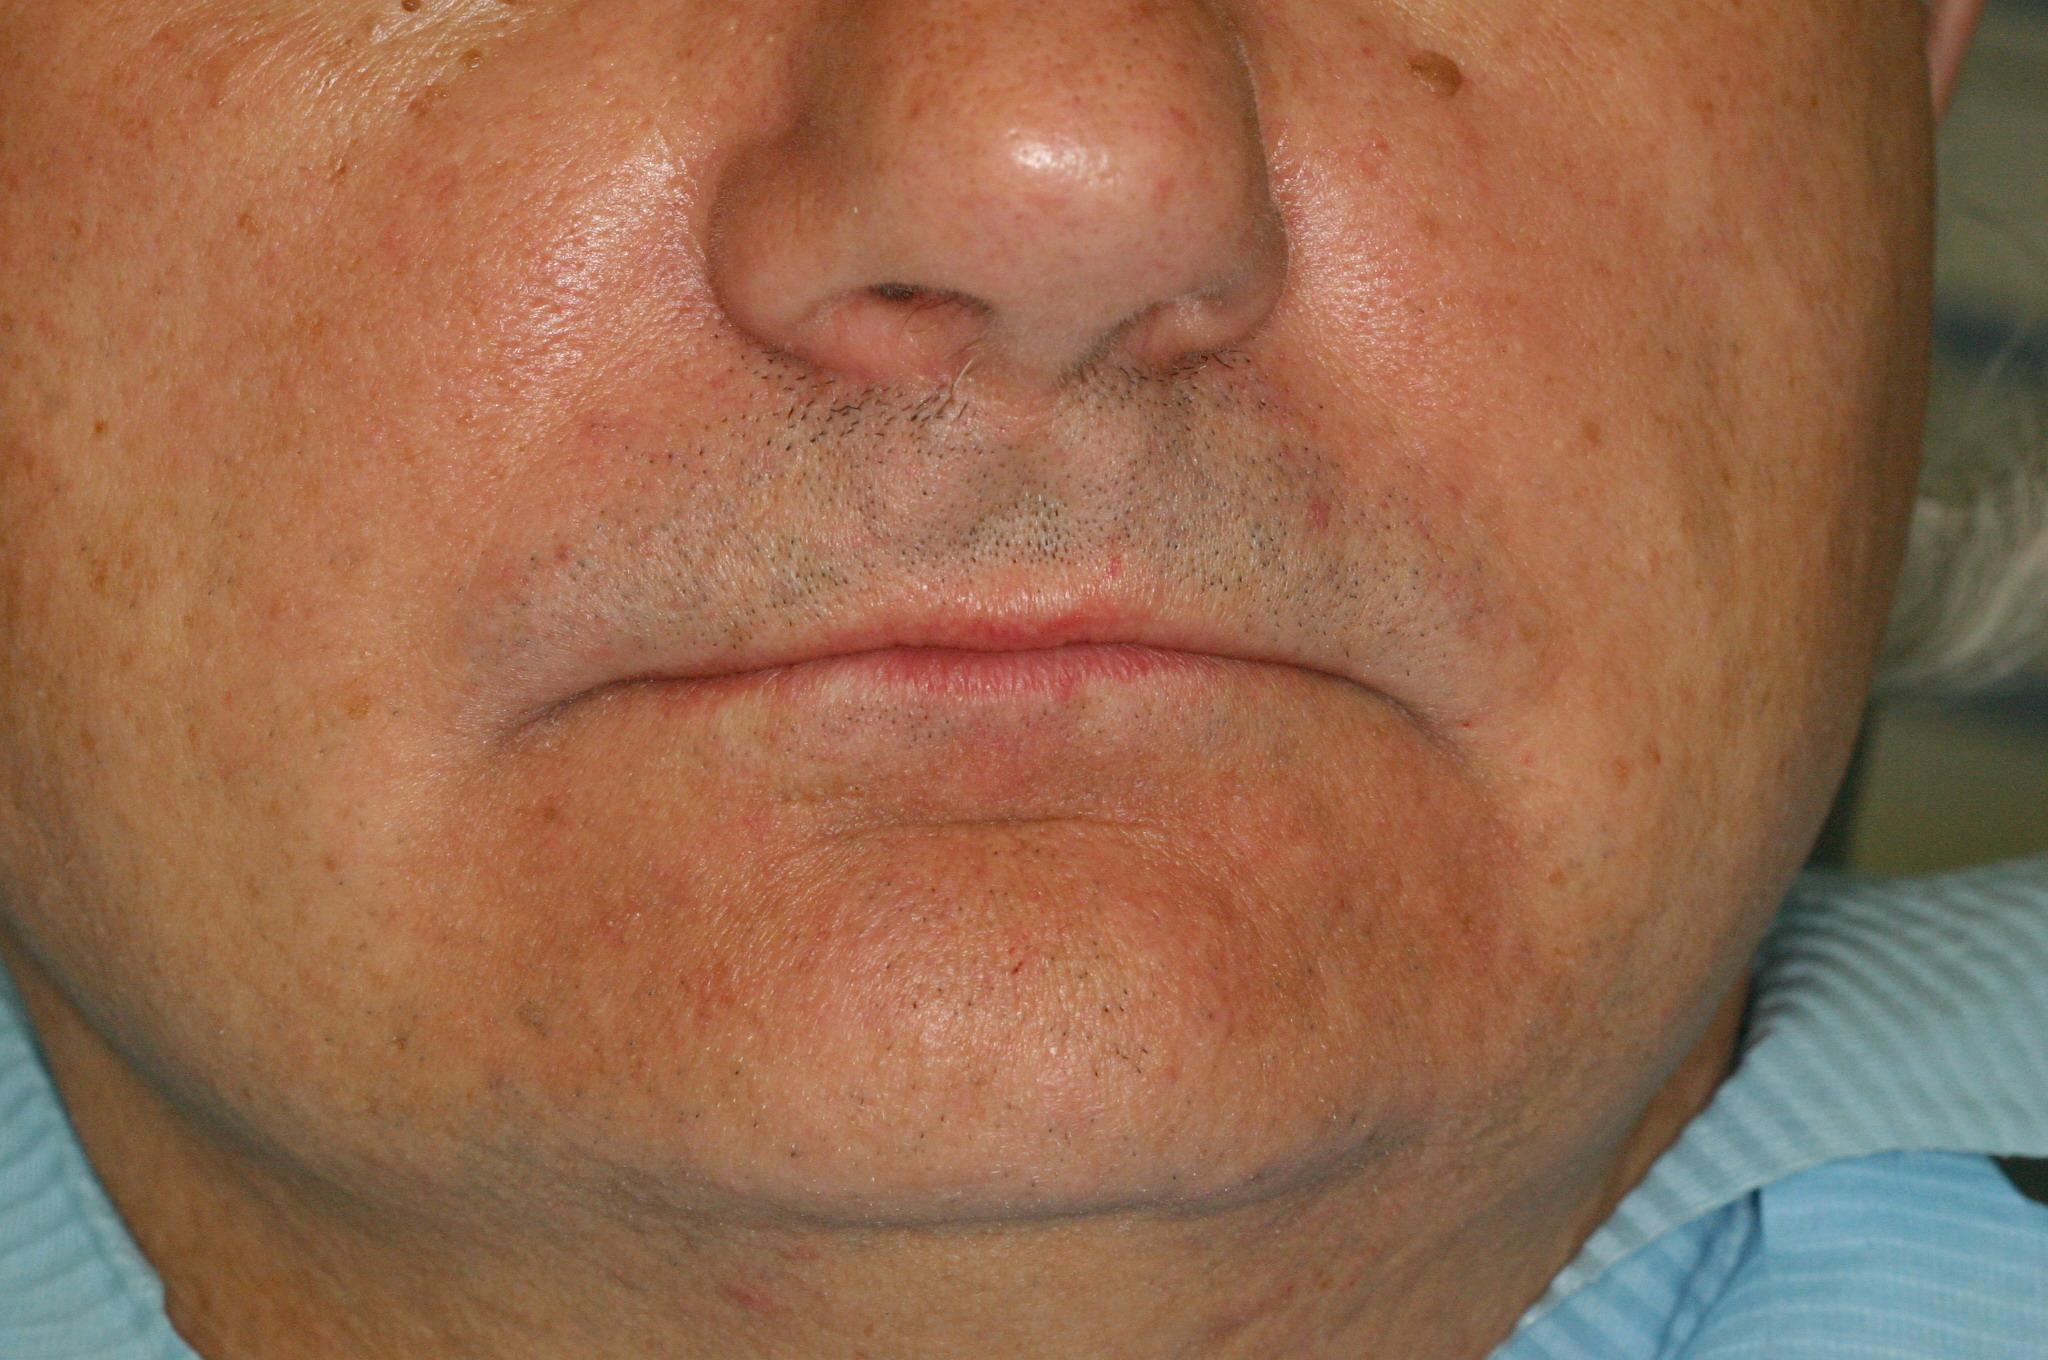 Рис 5а. Пациент, 65 лет, с ОМД, снижением нижней трети лица: фас.